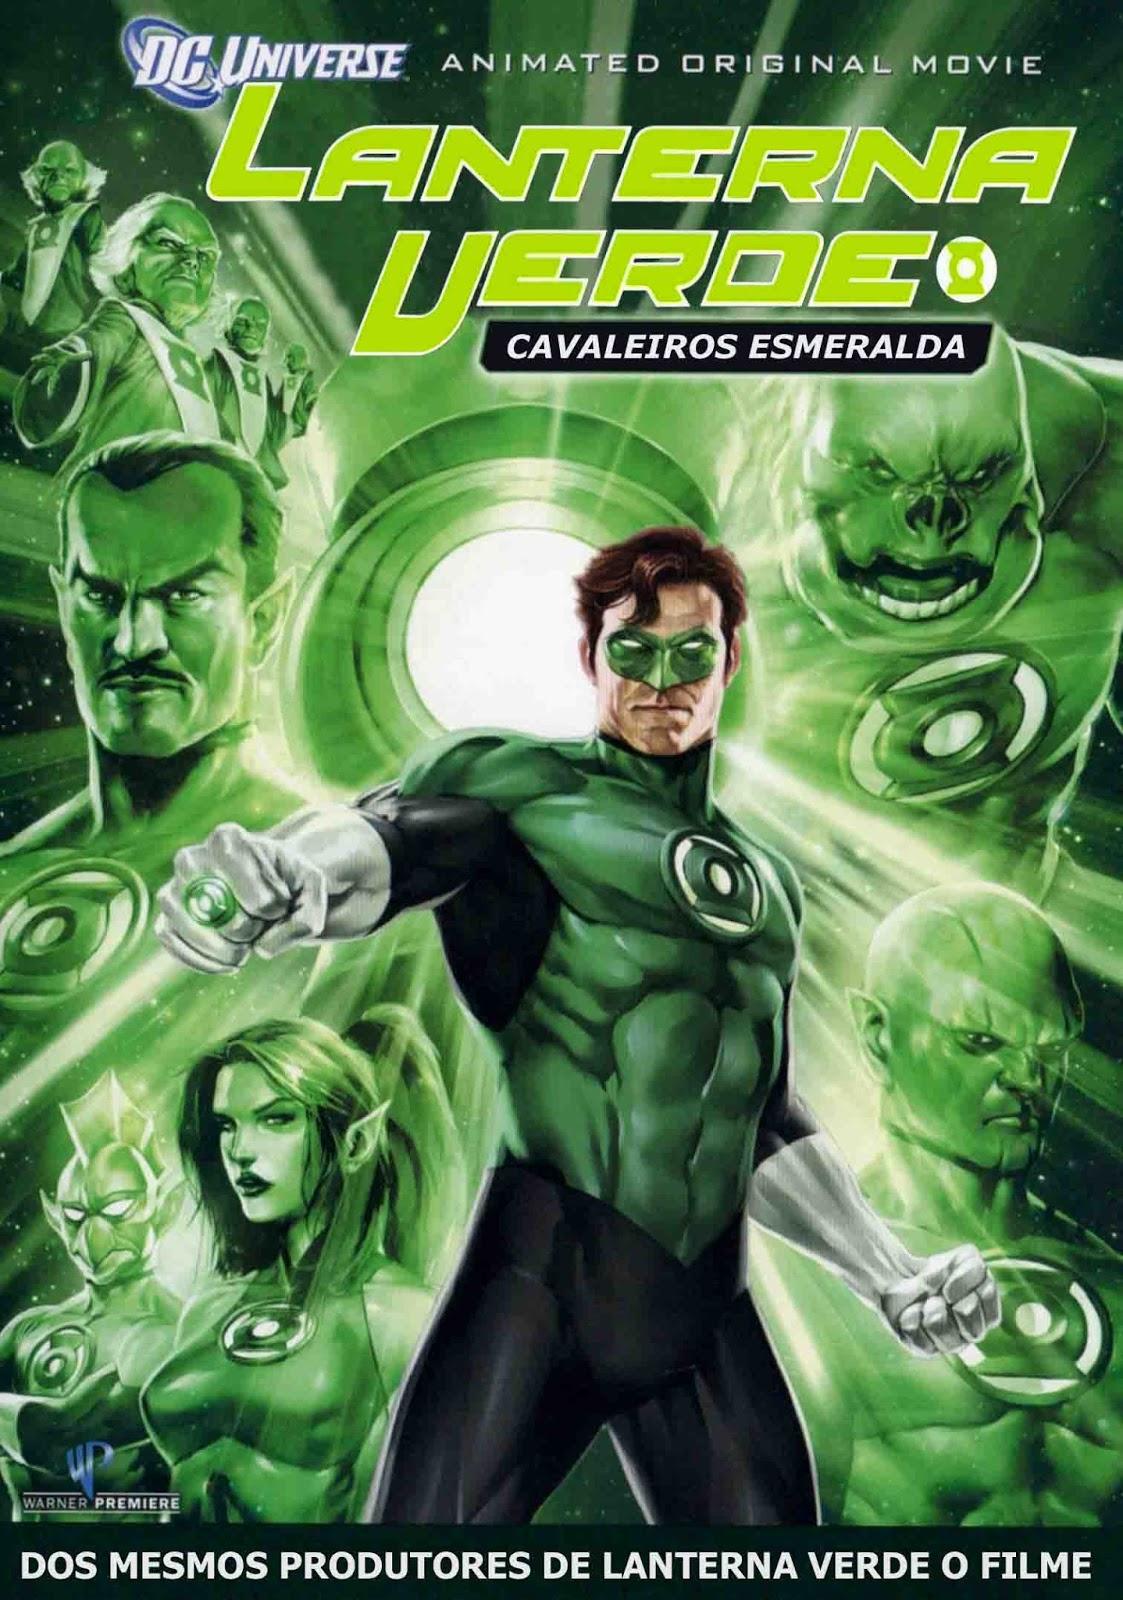 Lanterna Verde: Cavaleiros Esmeralda Torrent - Blu-ray Rip 1080p Dual Áudio (2011)